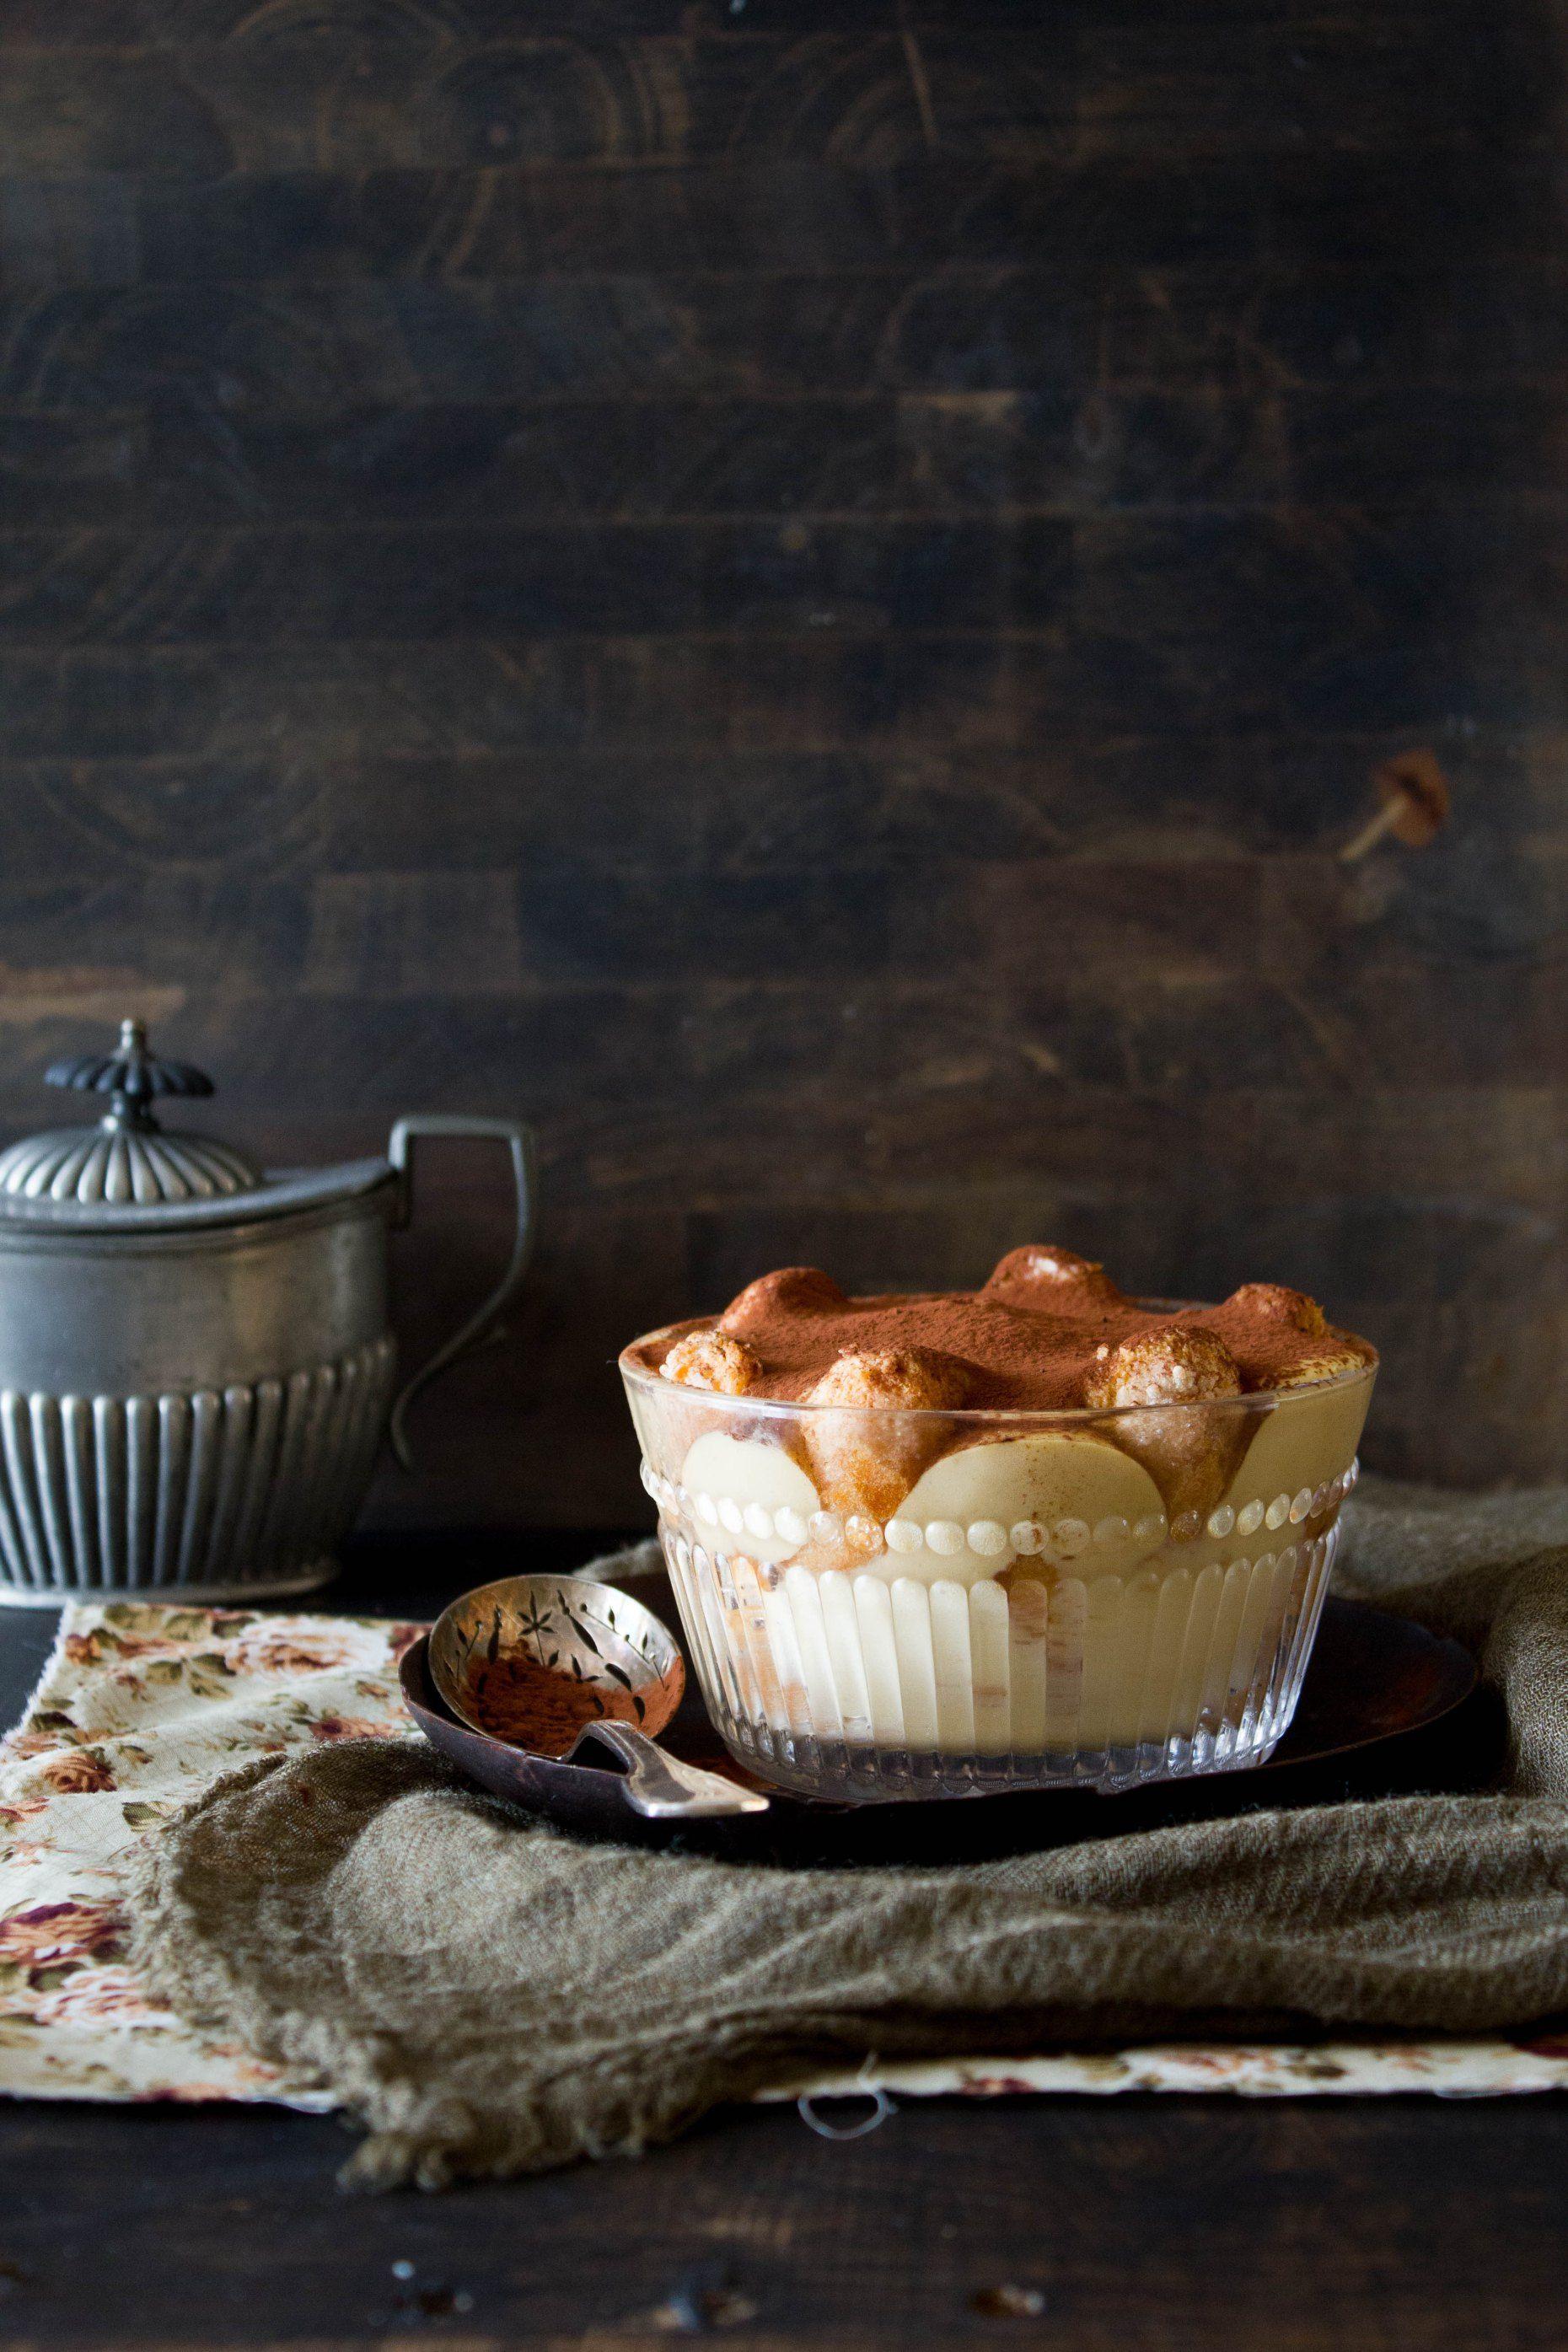 Tiramisu con crema pastelera al caramelo